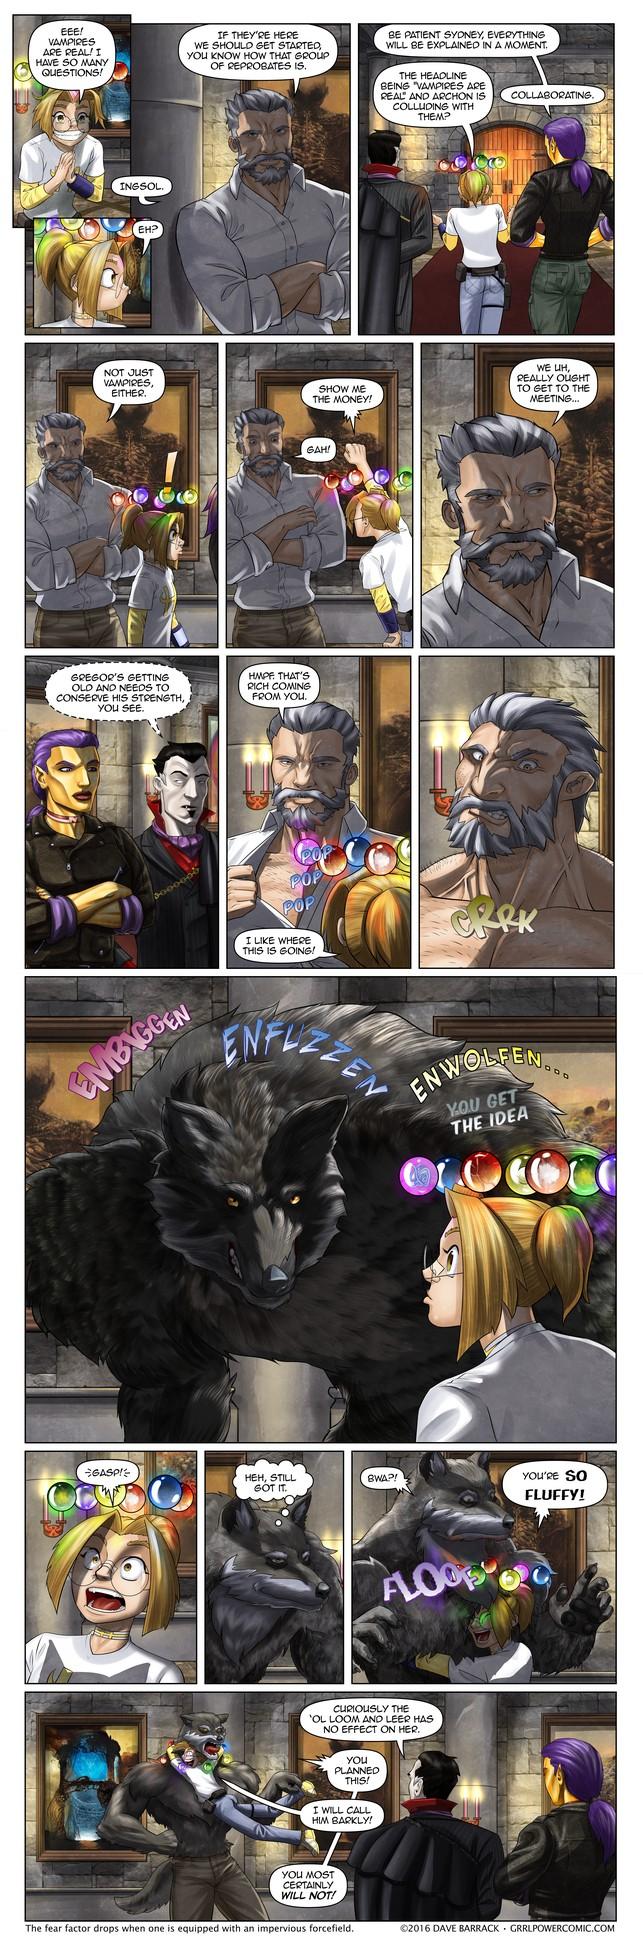 Grrl Power #441 – The wolfening